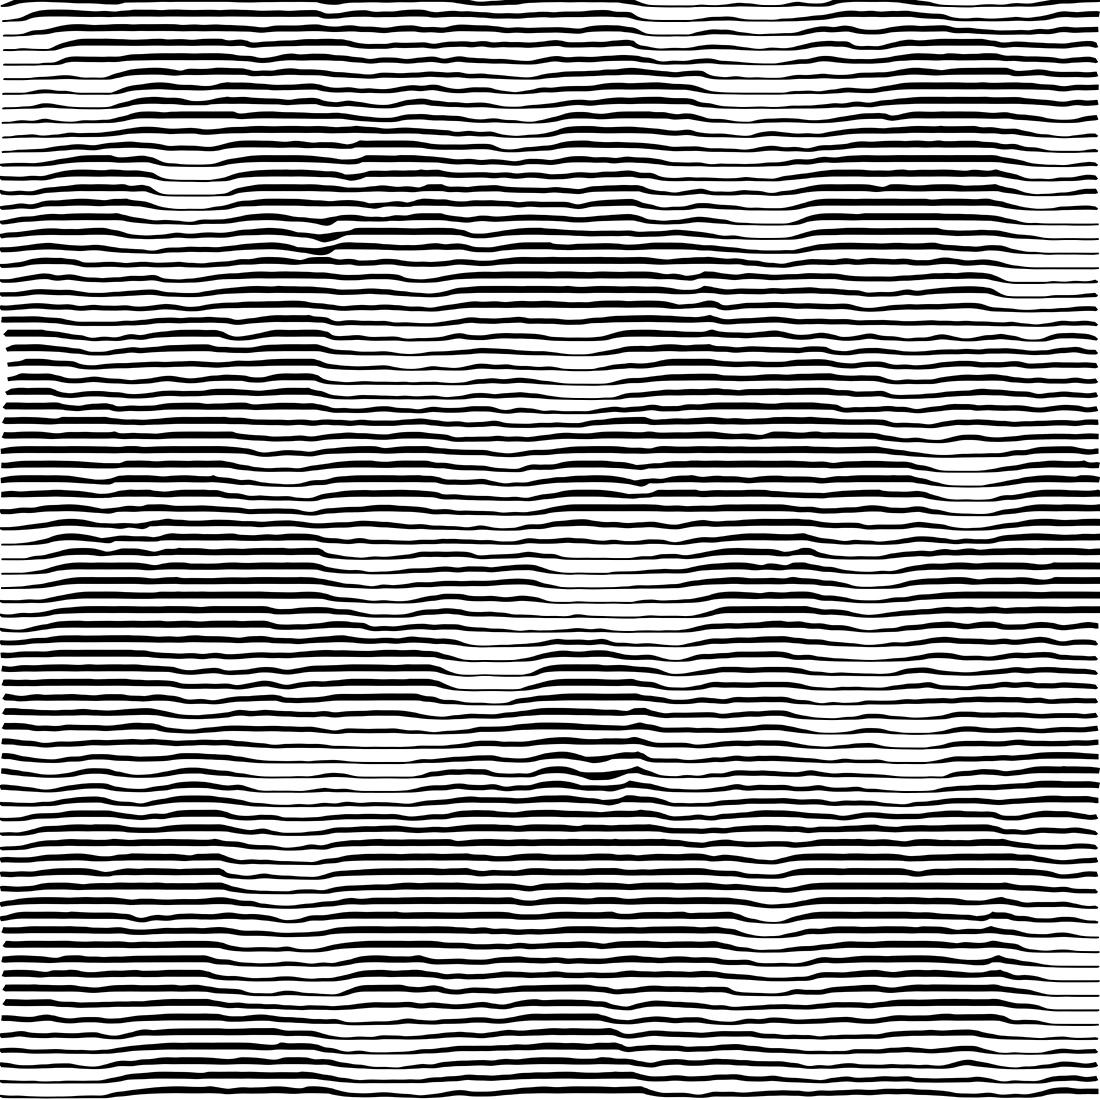 linee_10_piu_piccola